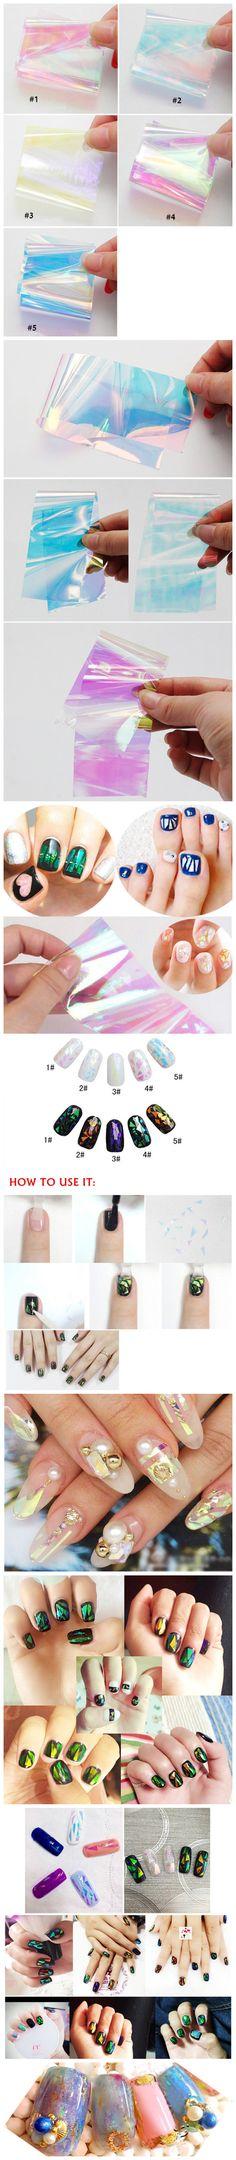 Shining Brilliantly Coloured Nail Art Irregular Glass Foil Mirror Slice Platinum Paper Nail Art Sticker